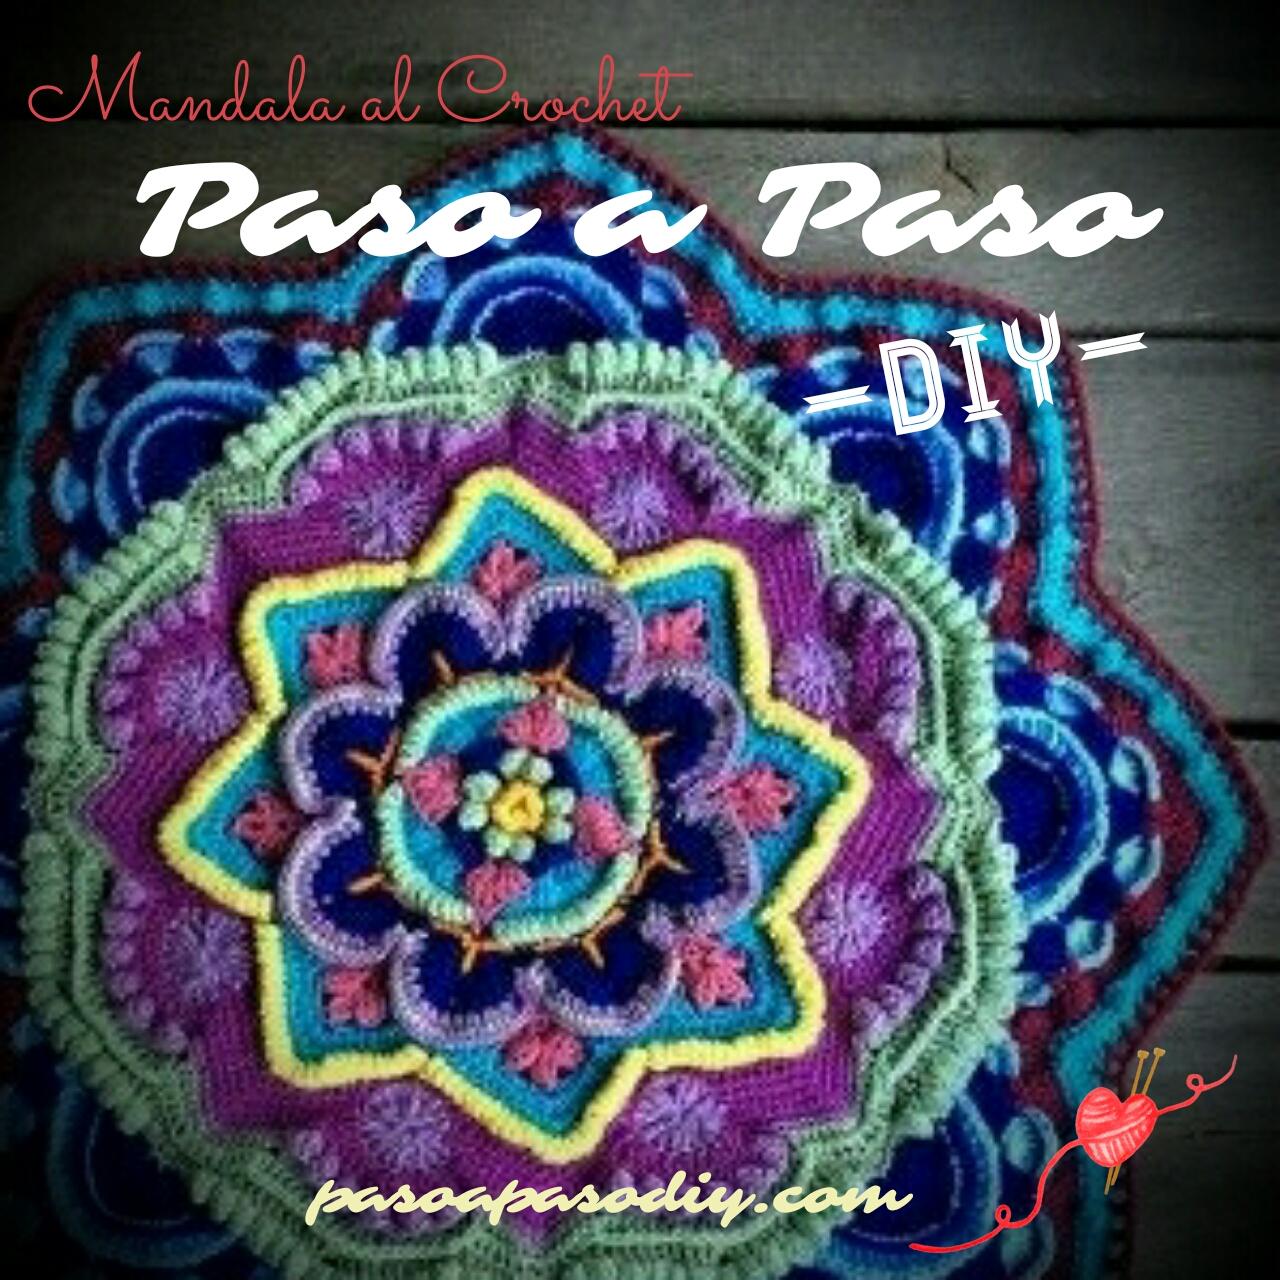 Mandala al Crochet - DIY | Paso a Paso